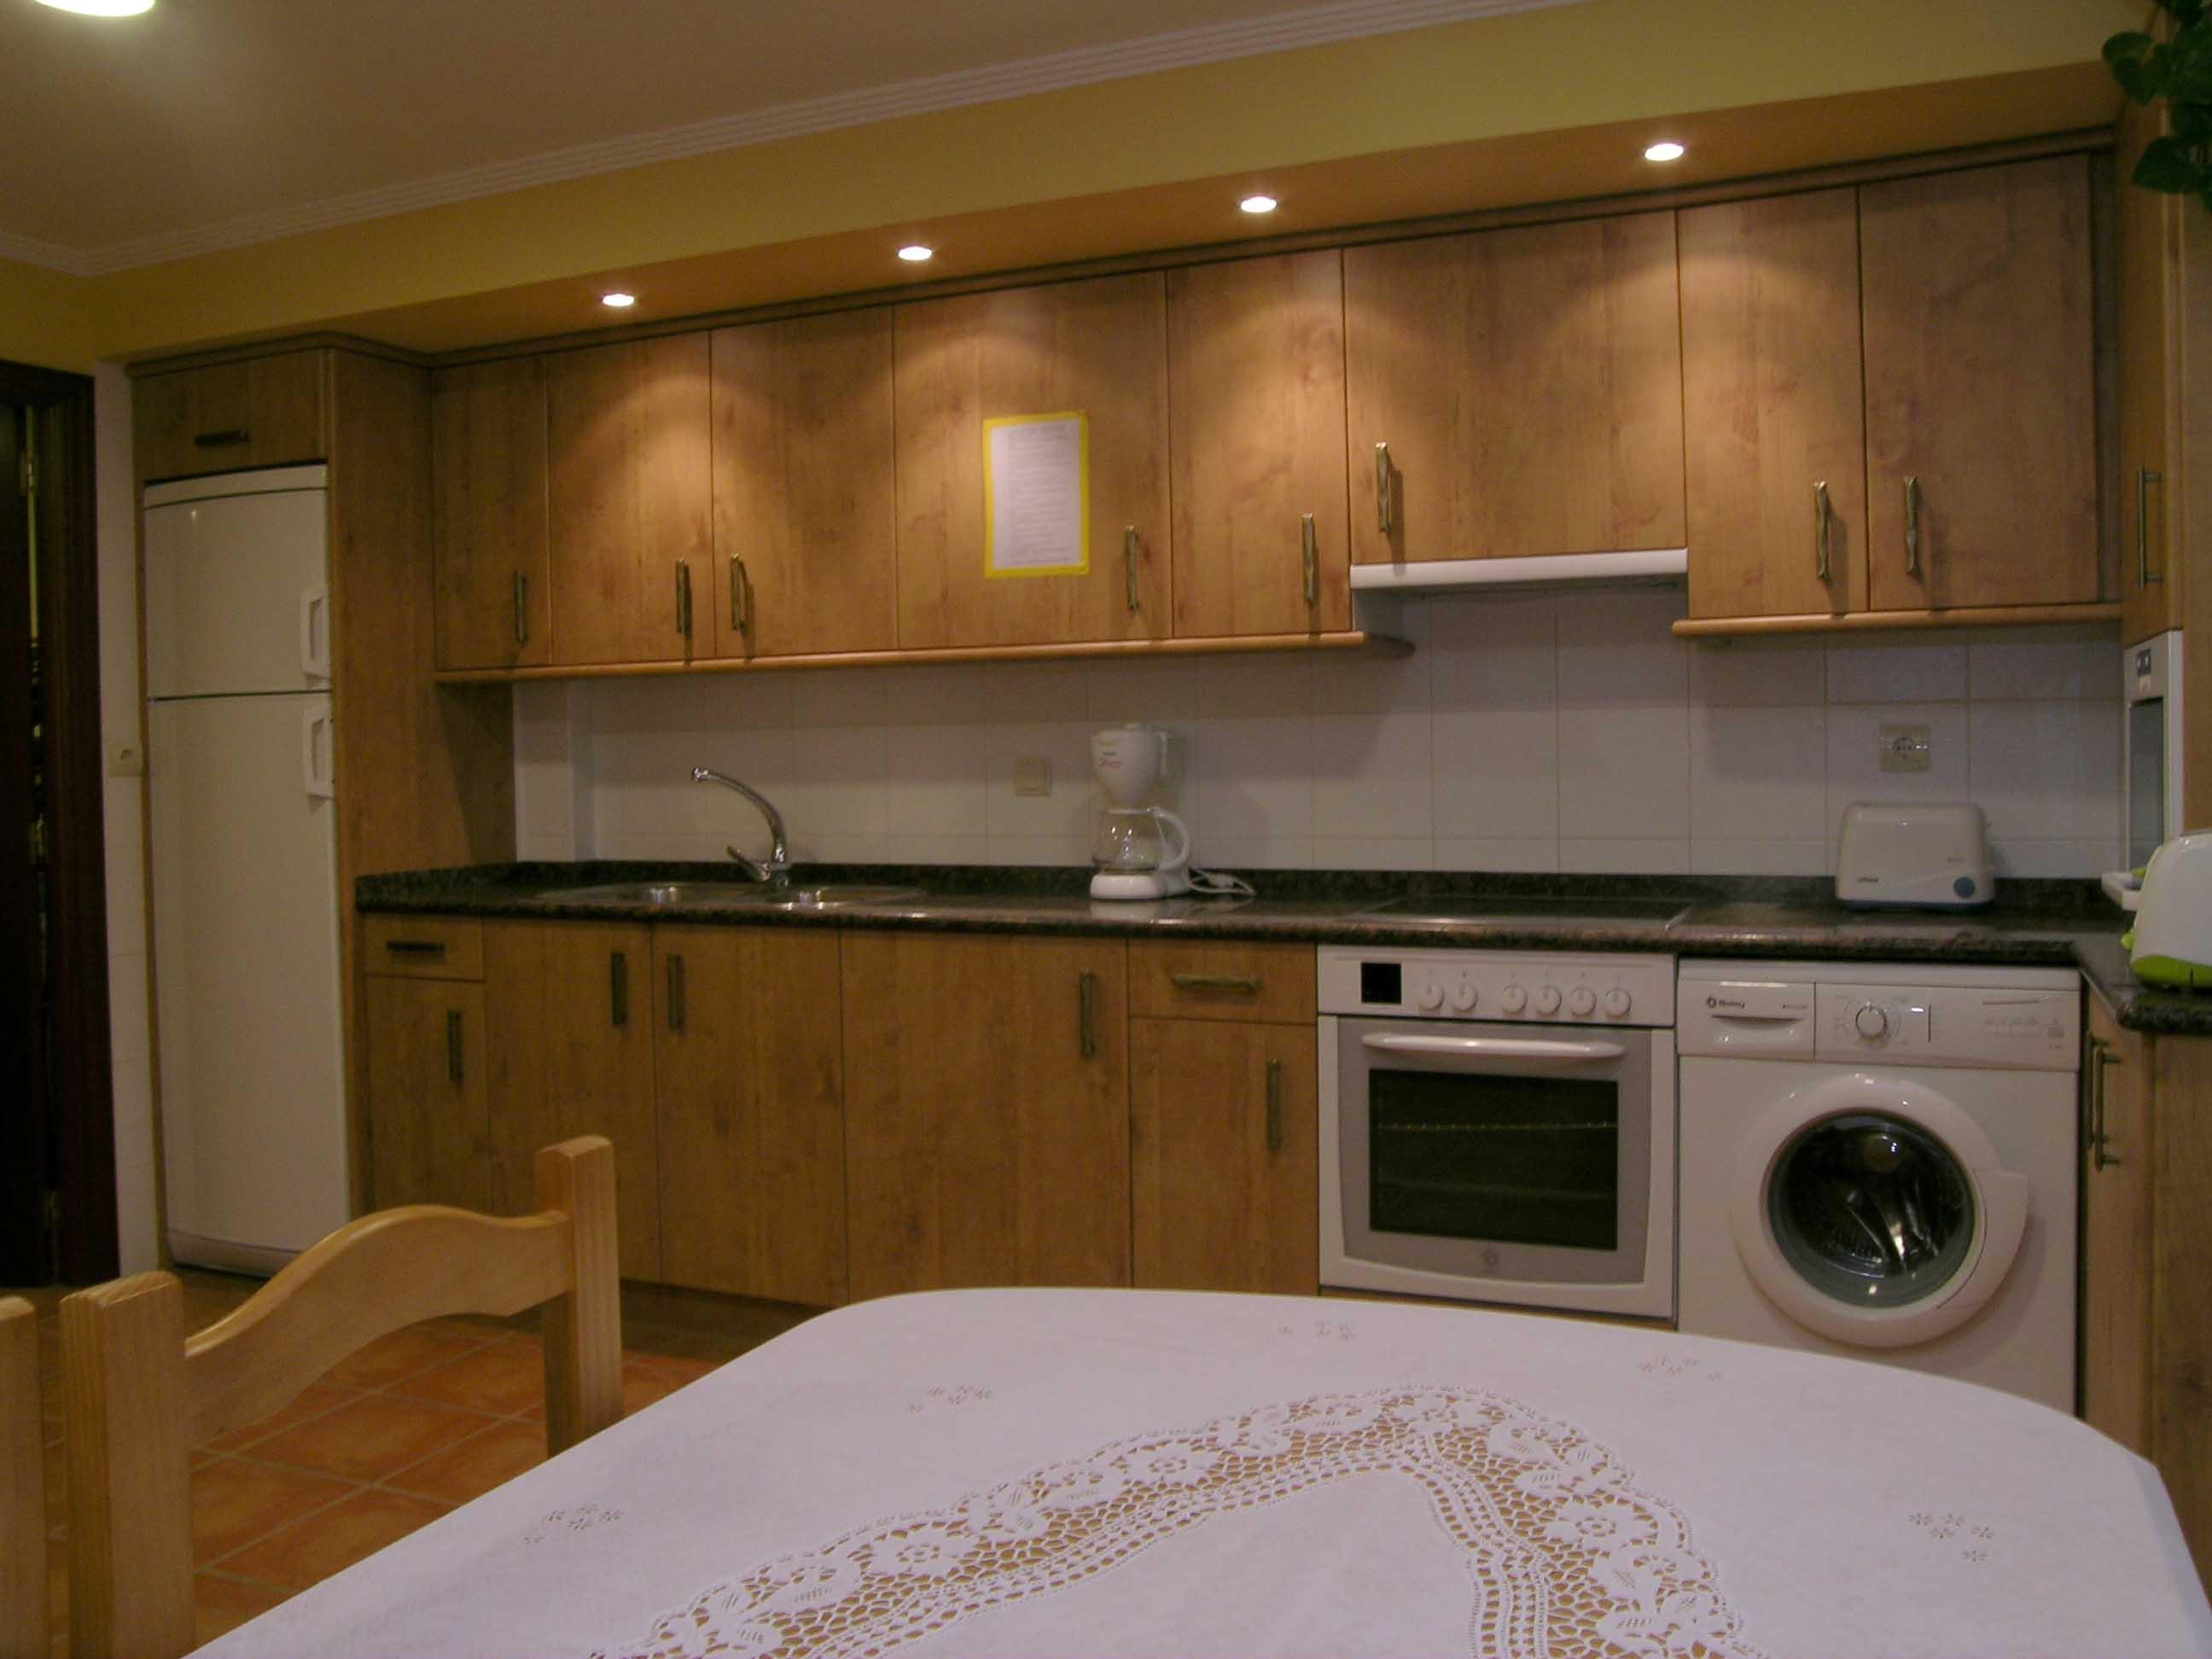 Itulazabal - cocina habitaciones